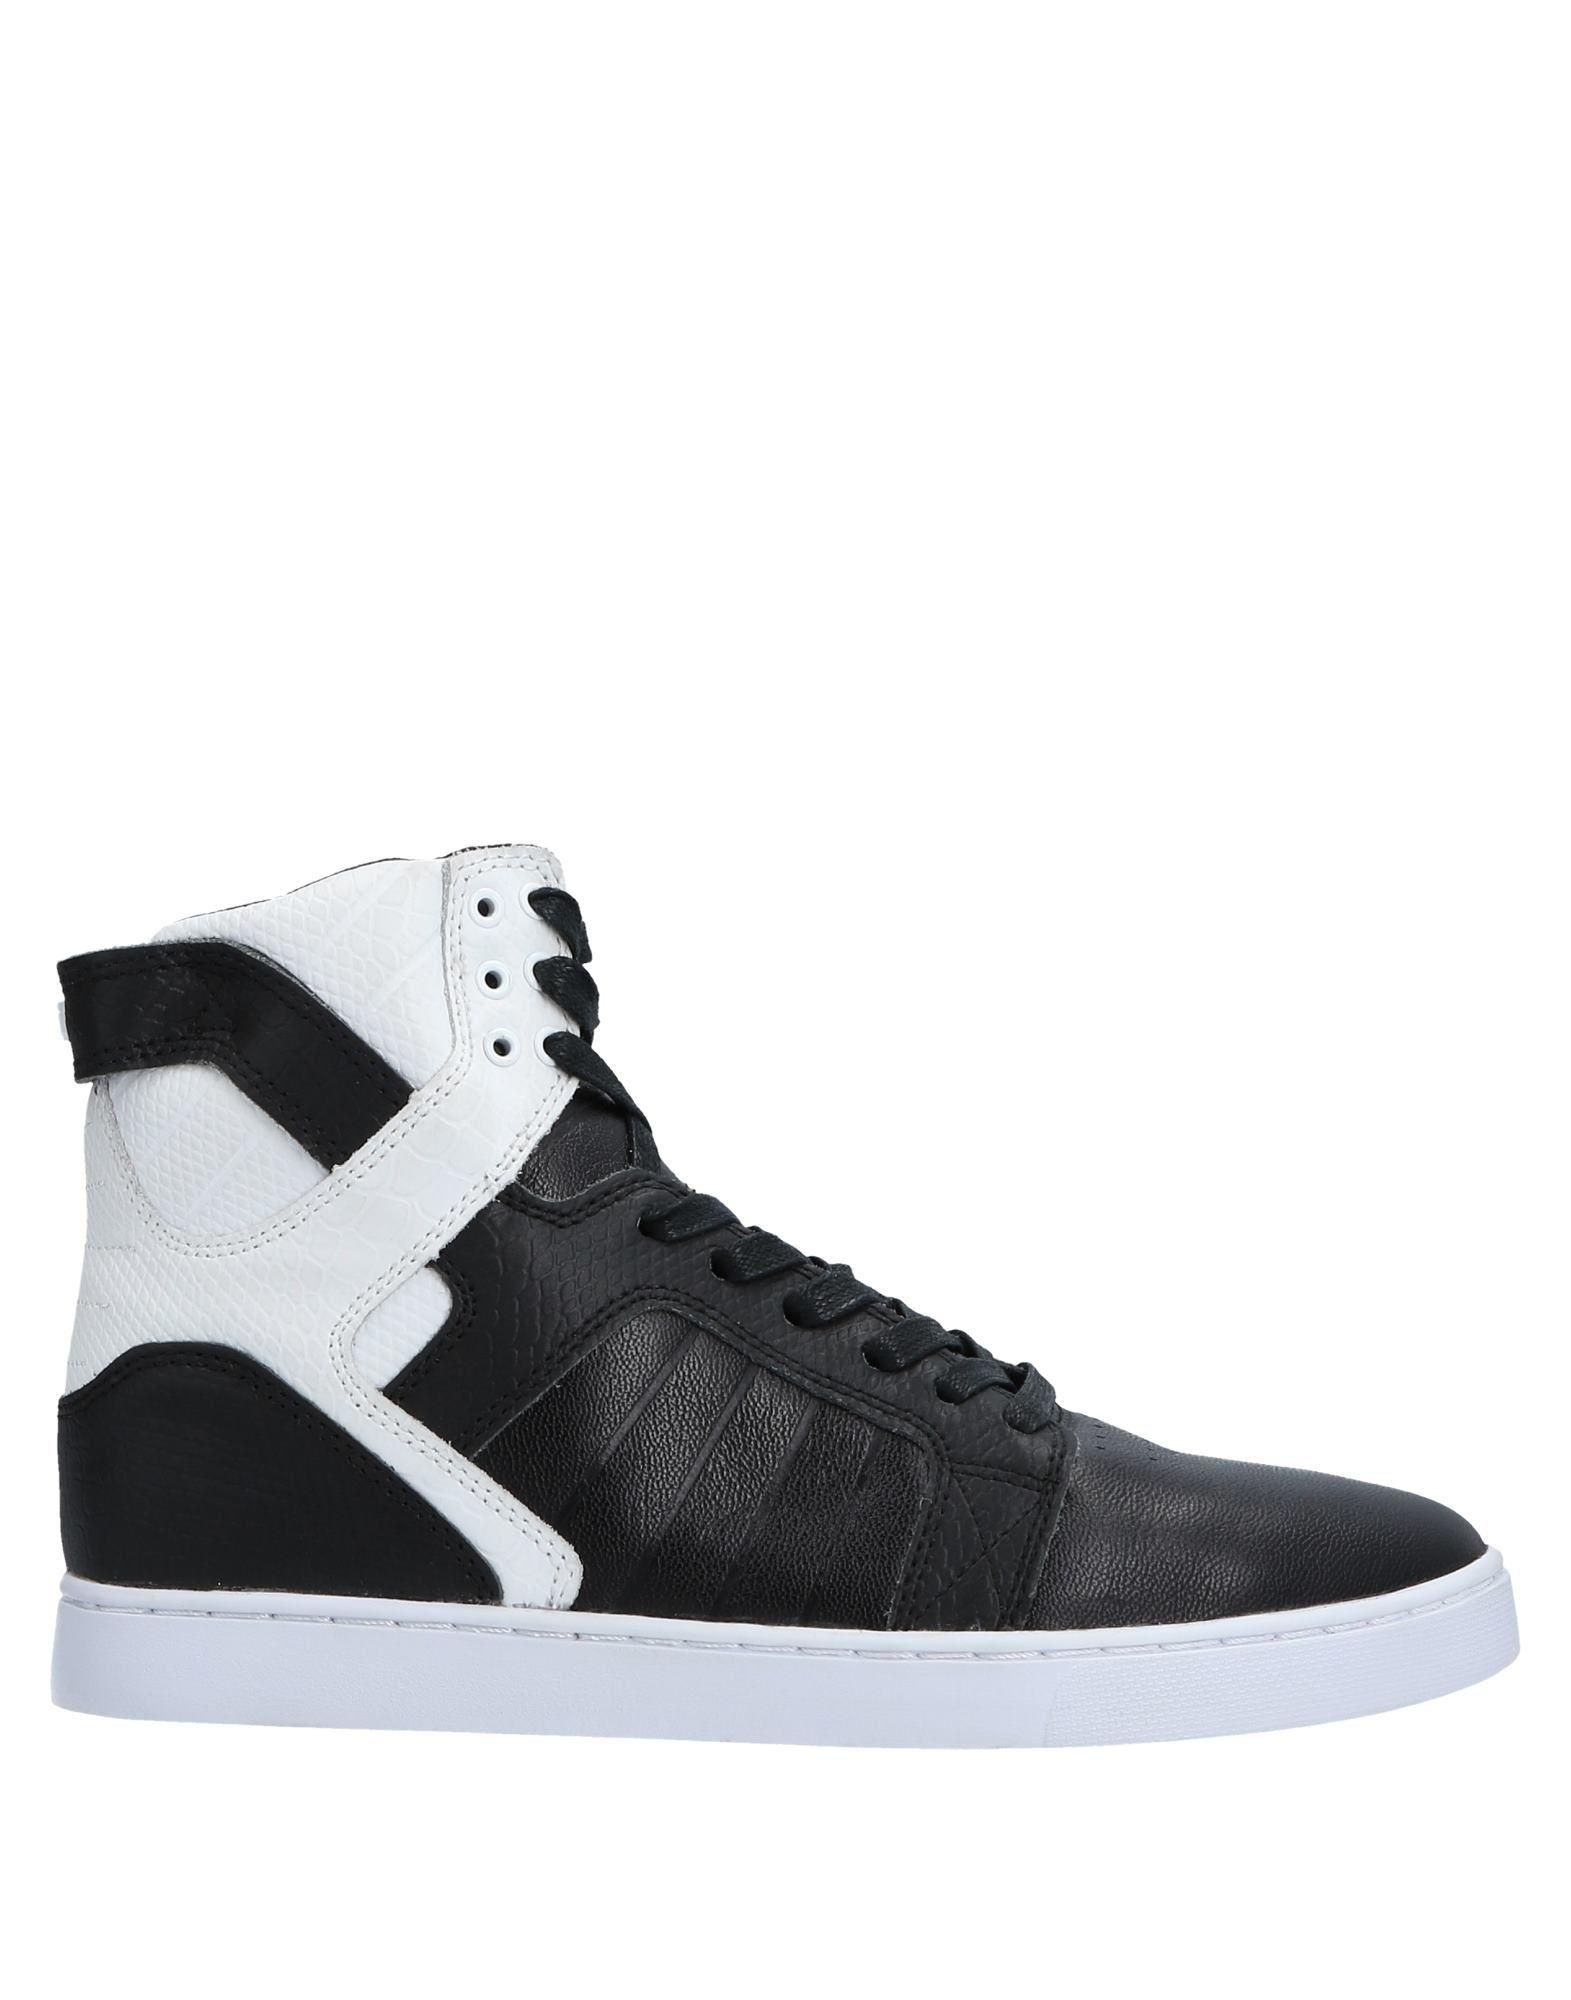 11530815DV Supra Sneakers Herren  11530815DV  73d6af